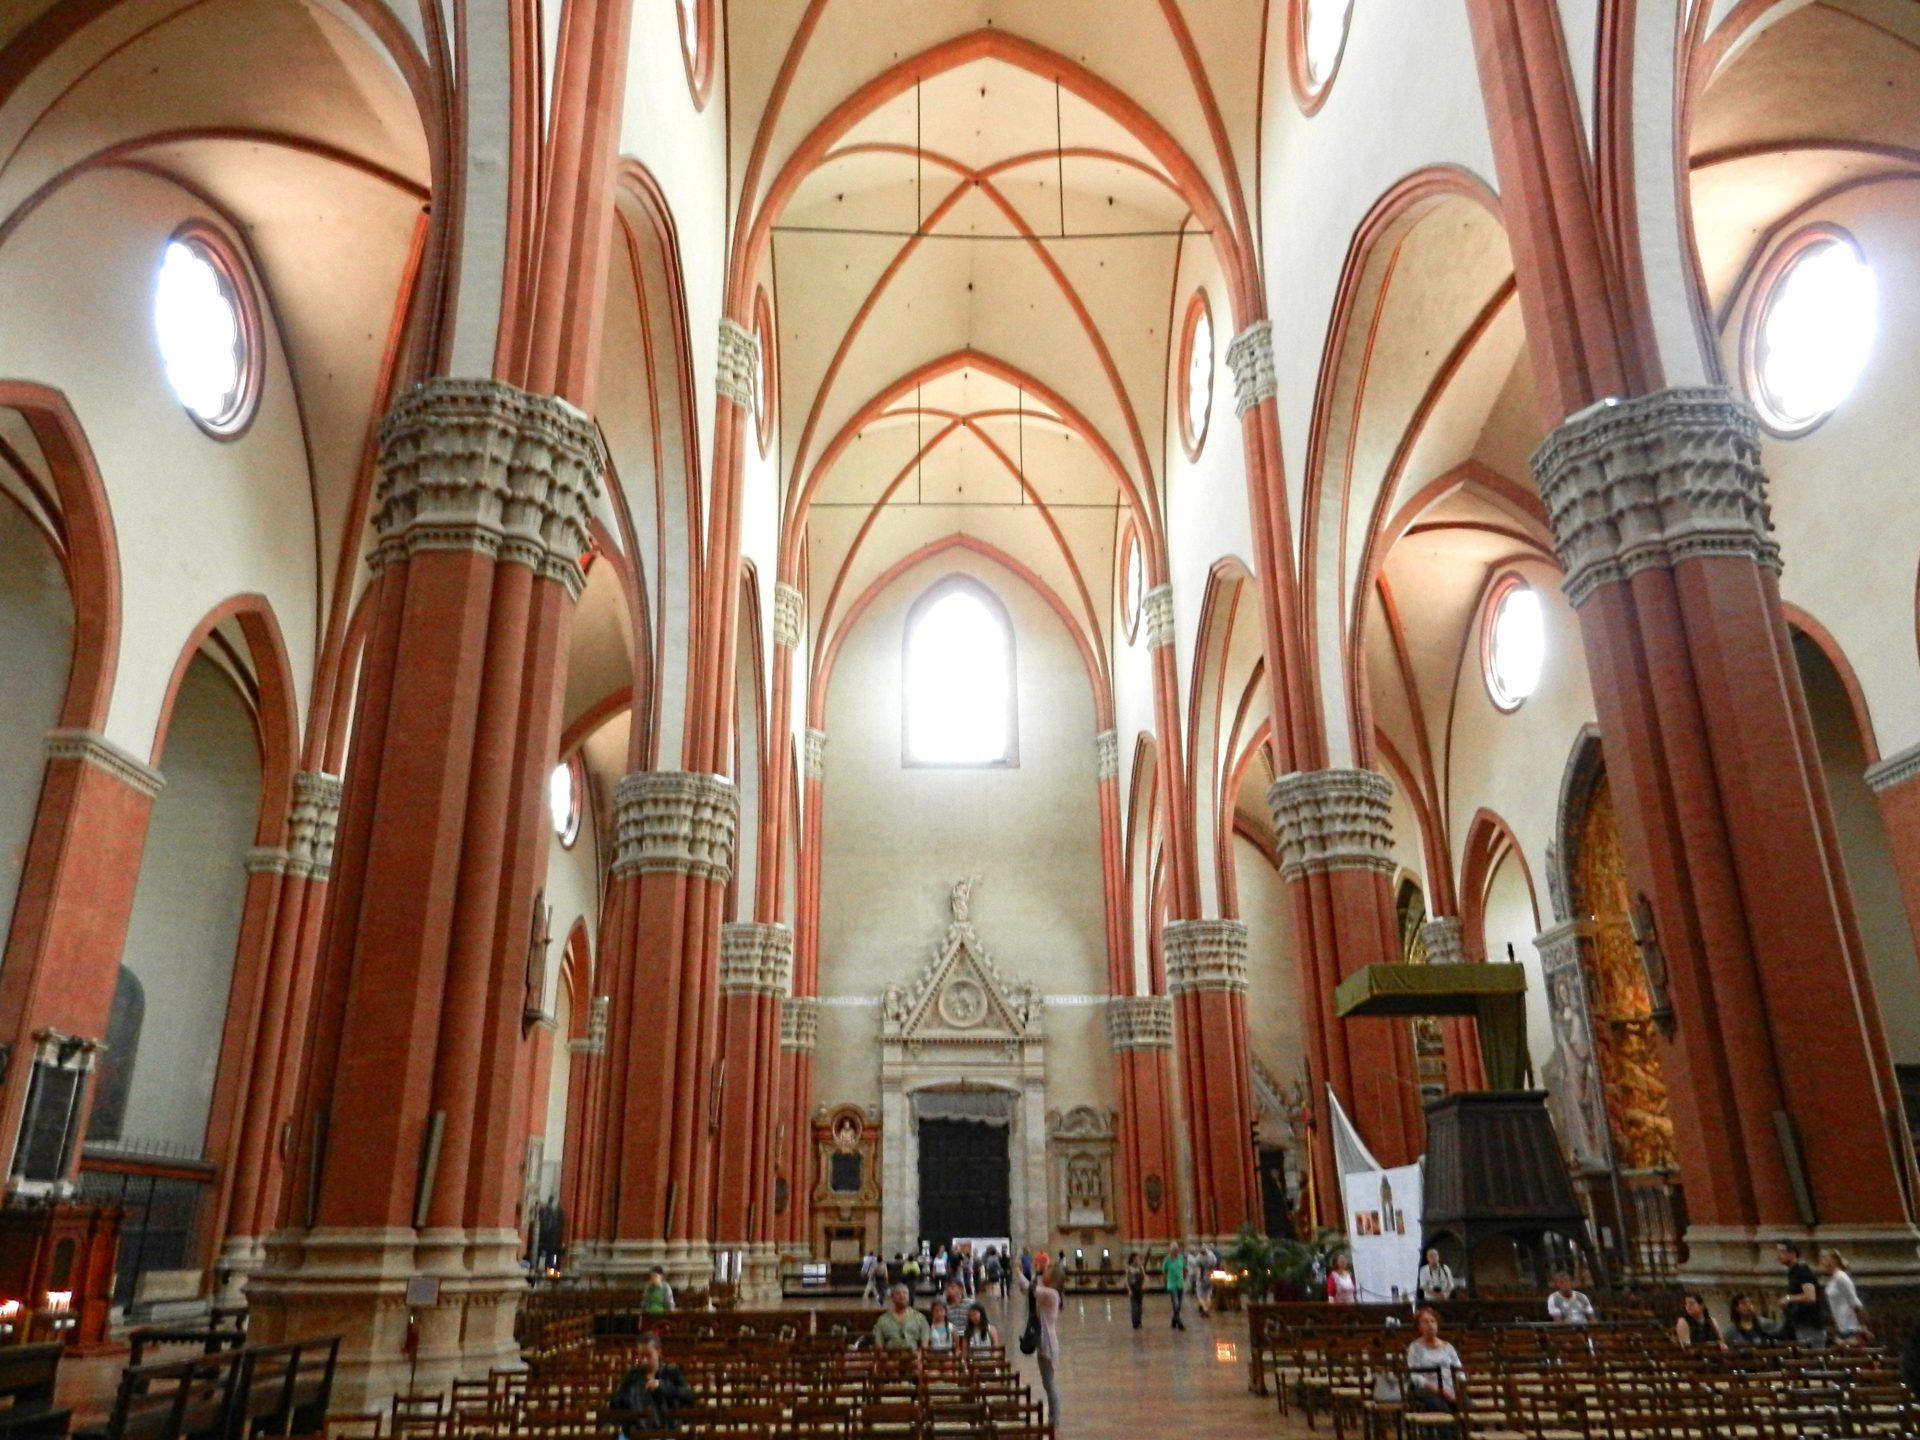 Basilica Di San Petronio Interior Bologna Italy The